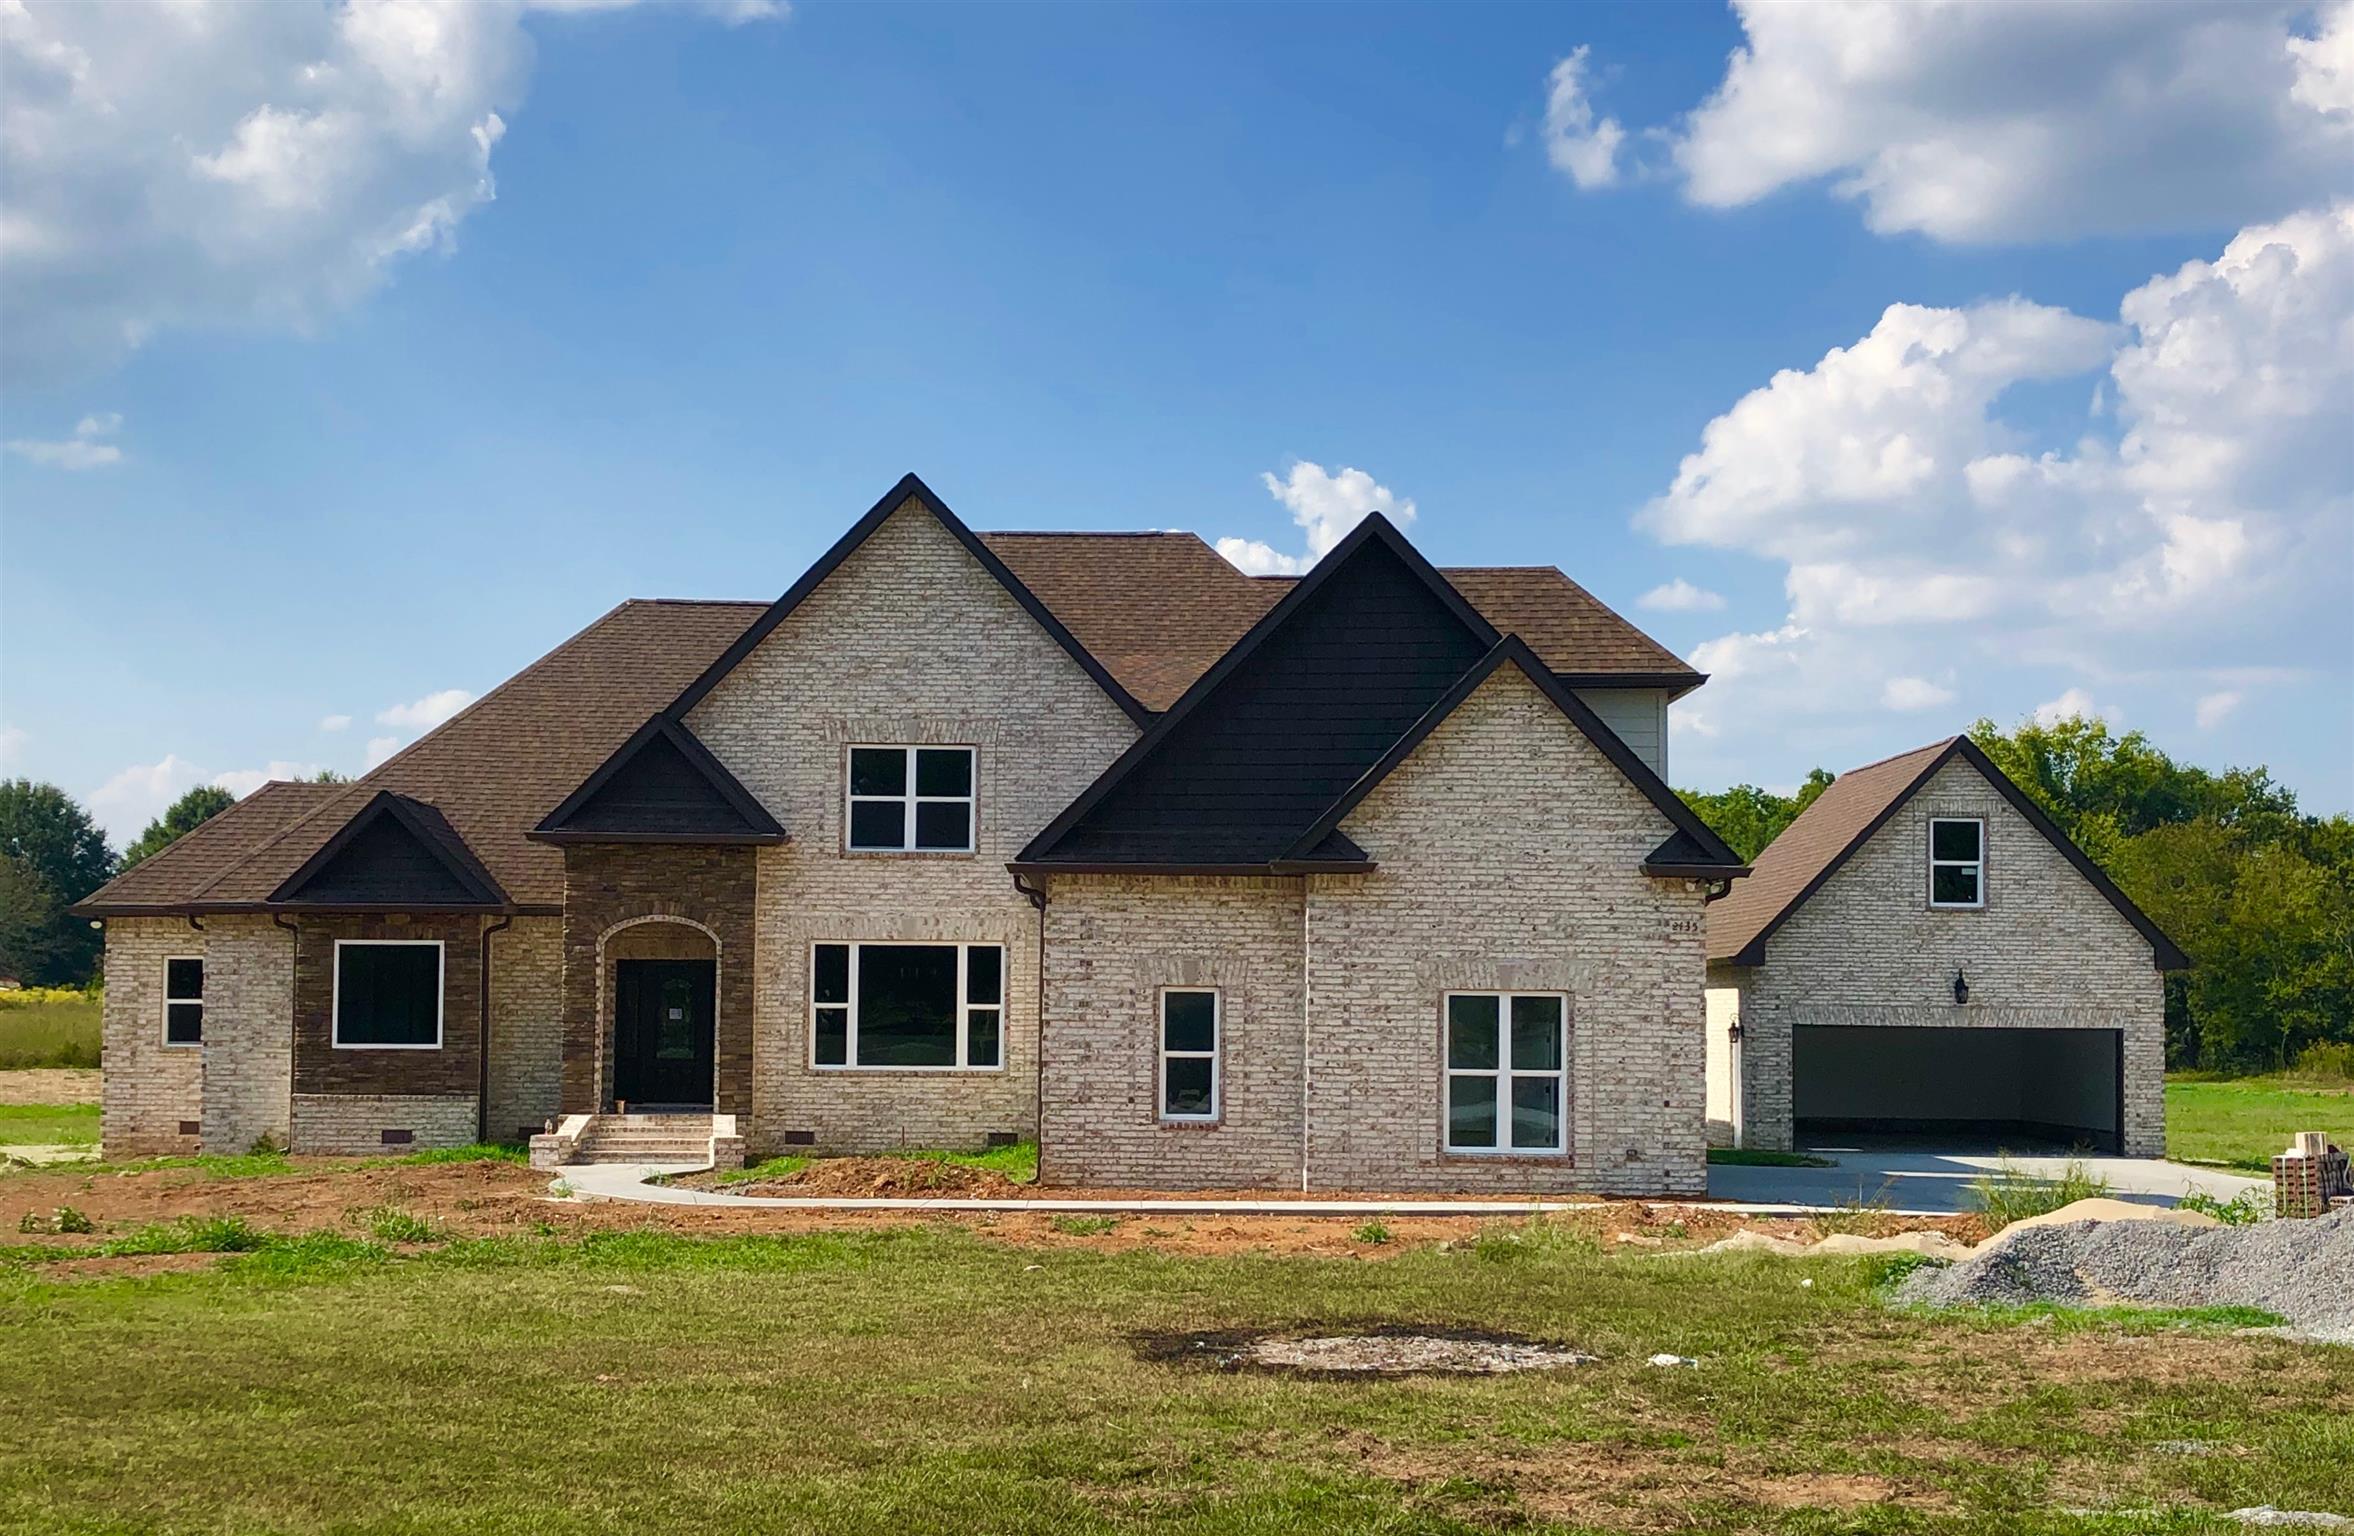 2135 Stewart Creek Rd, Murfreesboro, TN 37129 - Murfreesboro, TN real estate listing